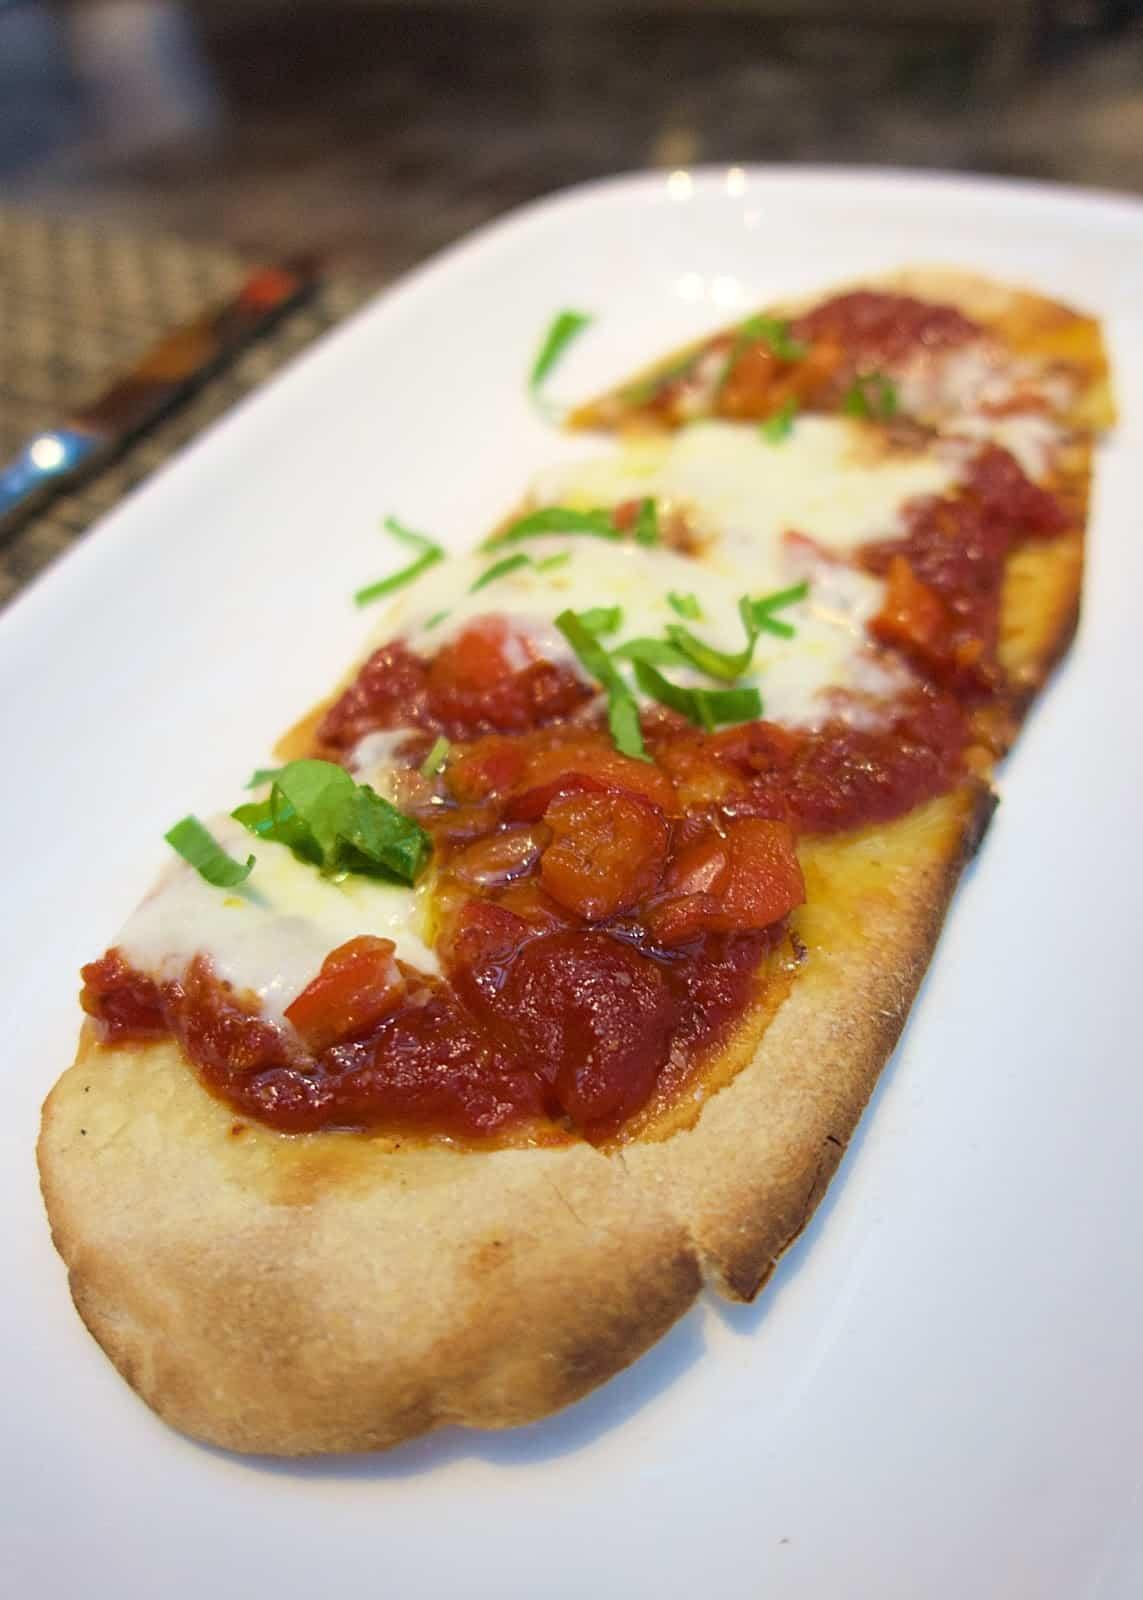 Tom Colicchio's Heritage Steak - Tomato Flatbread with Burrata Cheese